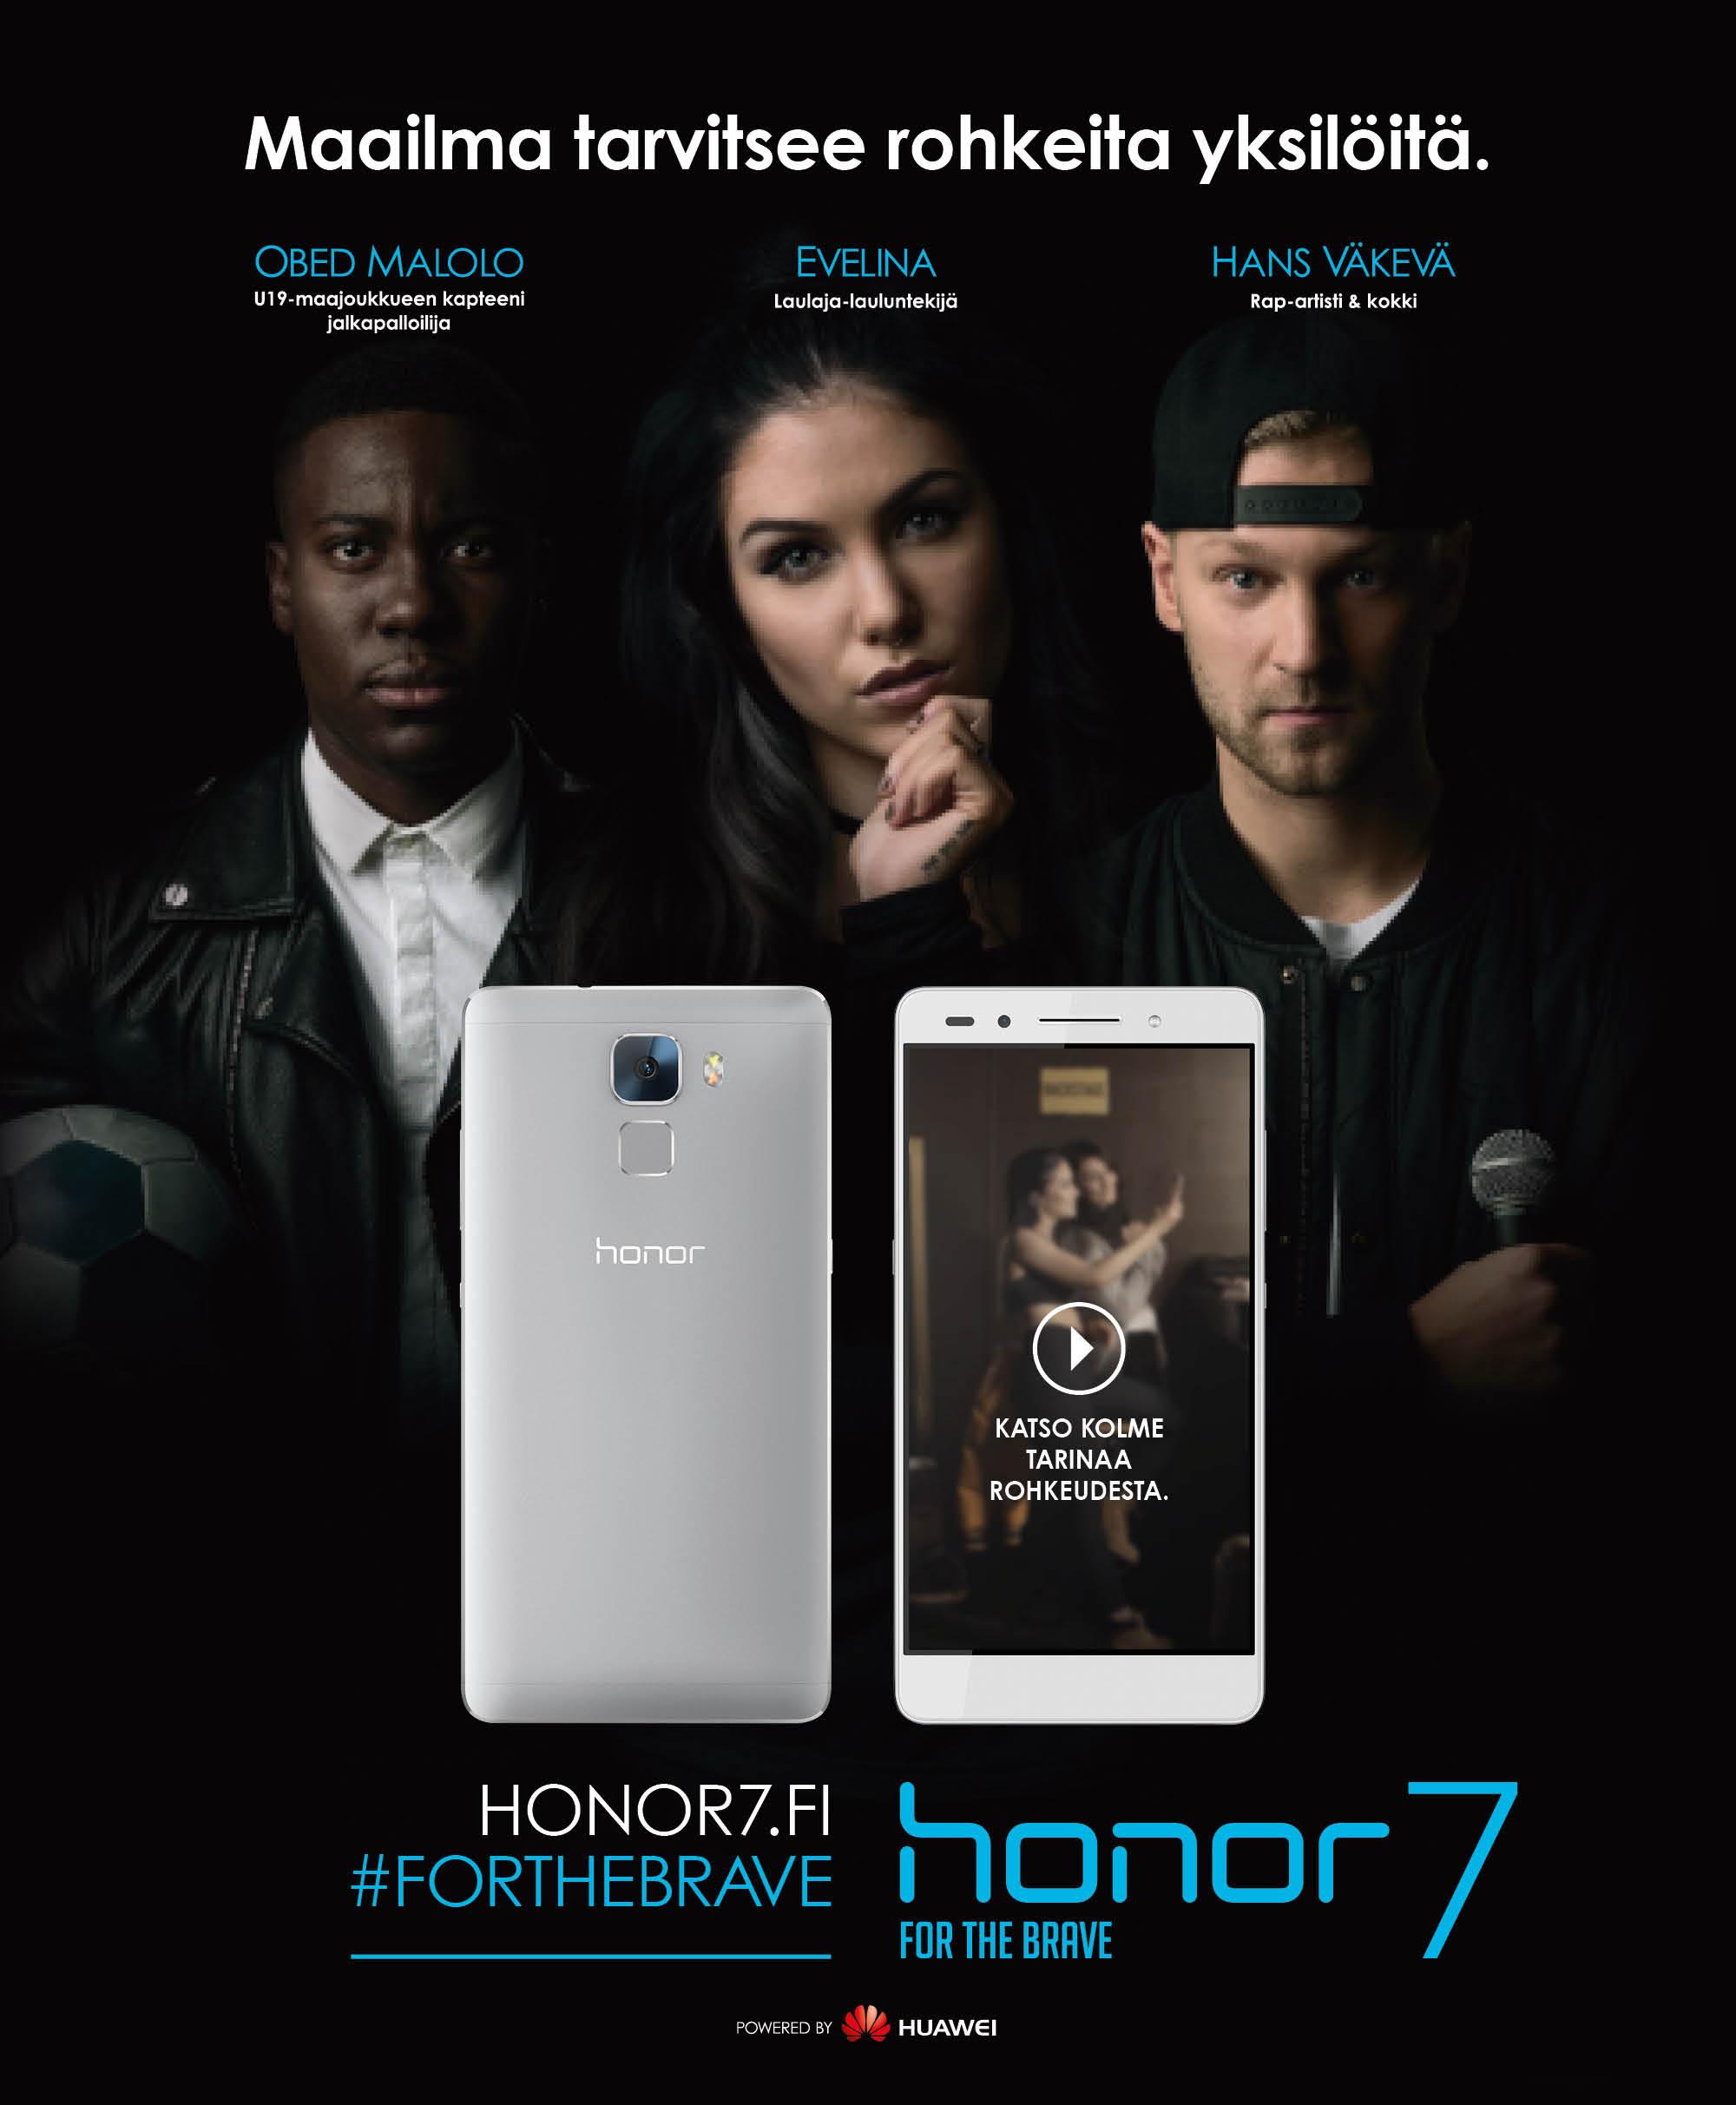 Honor7_HS_02_254x308 LR.jpeg